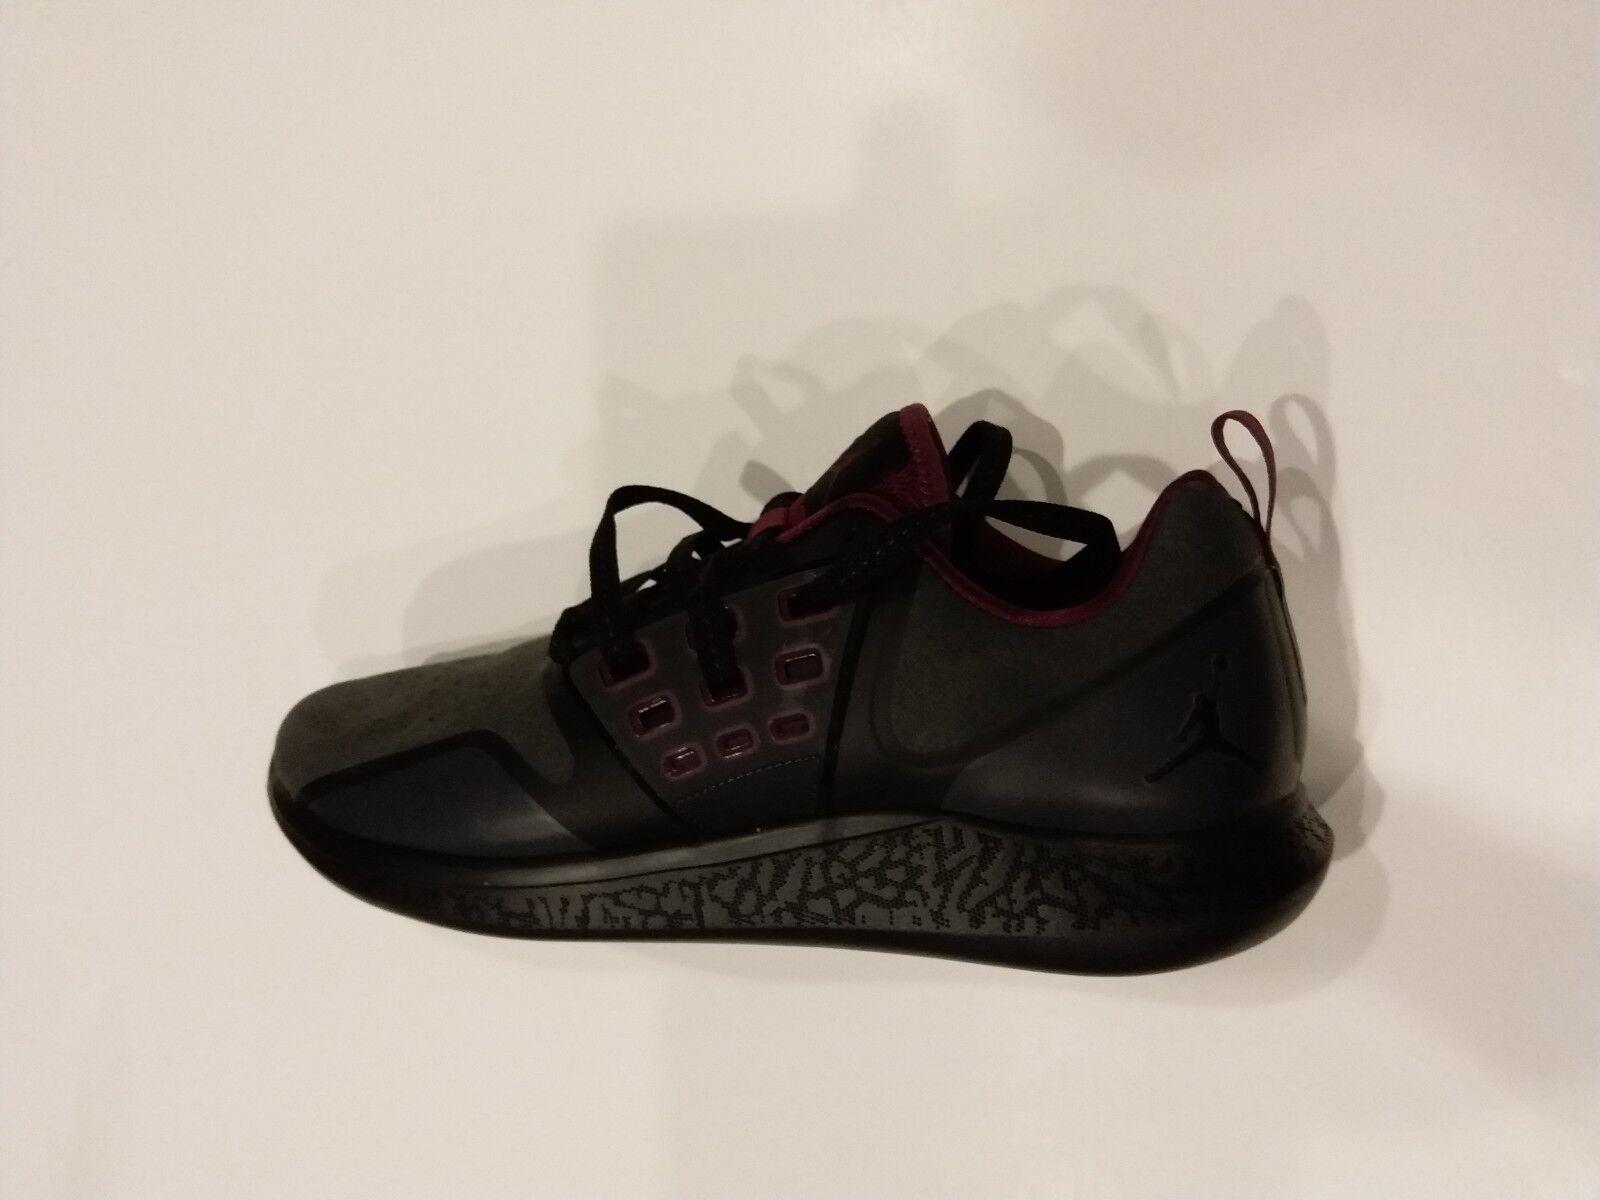 NIKE AIR JORDAN LUNAR GRIND Uomo 12 nero nero nero Training scarpe NEW AA4302-017 9ba527